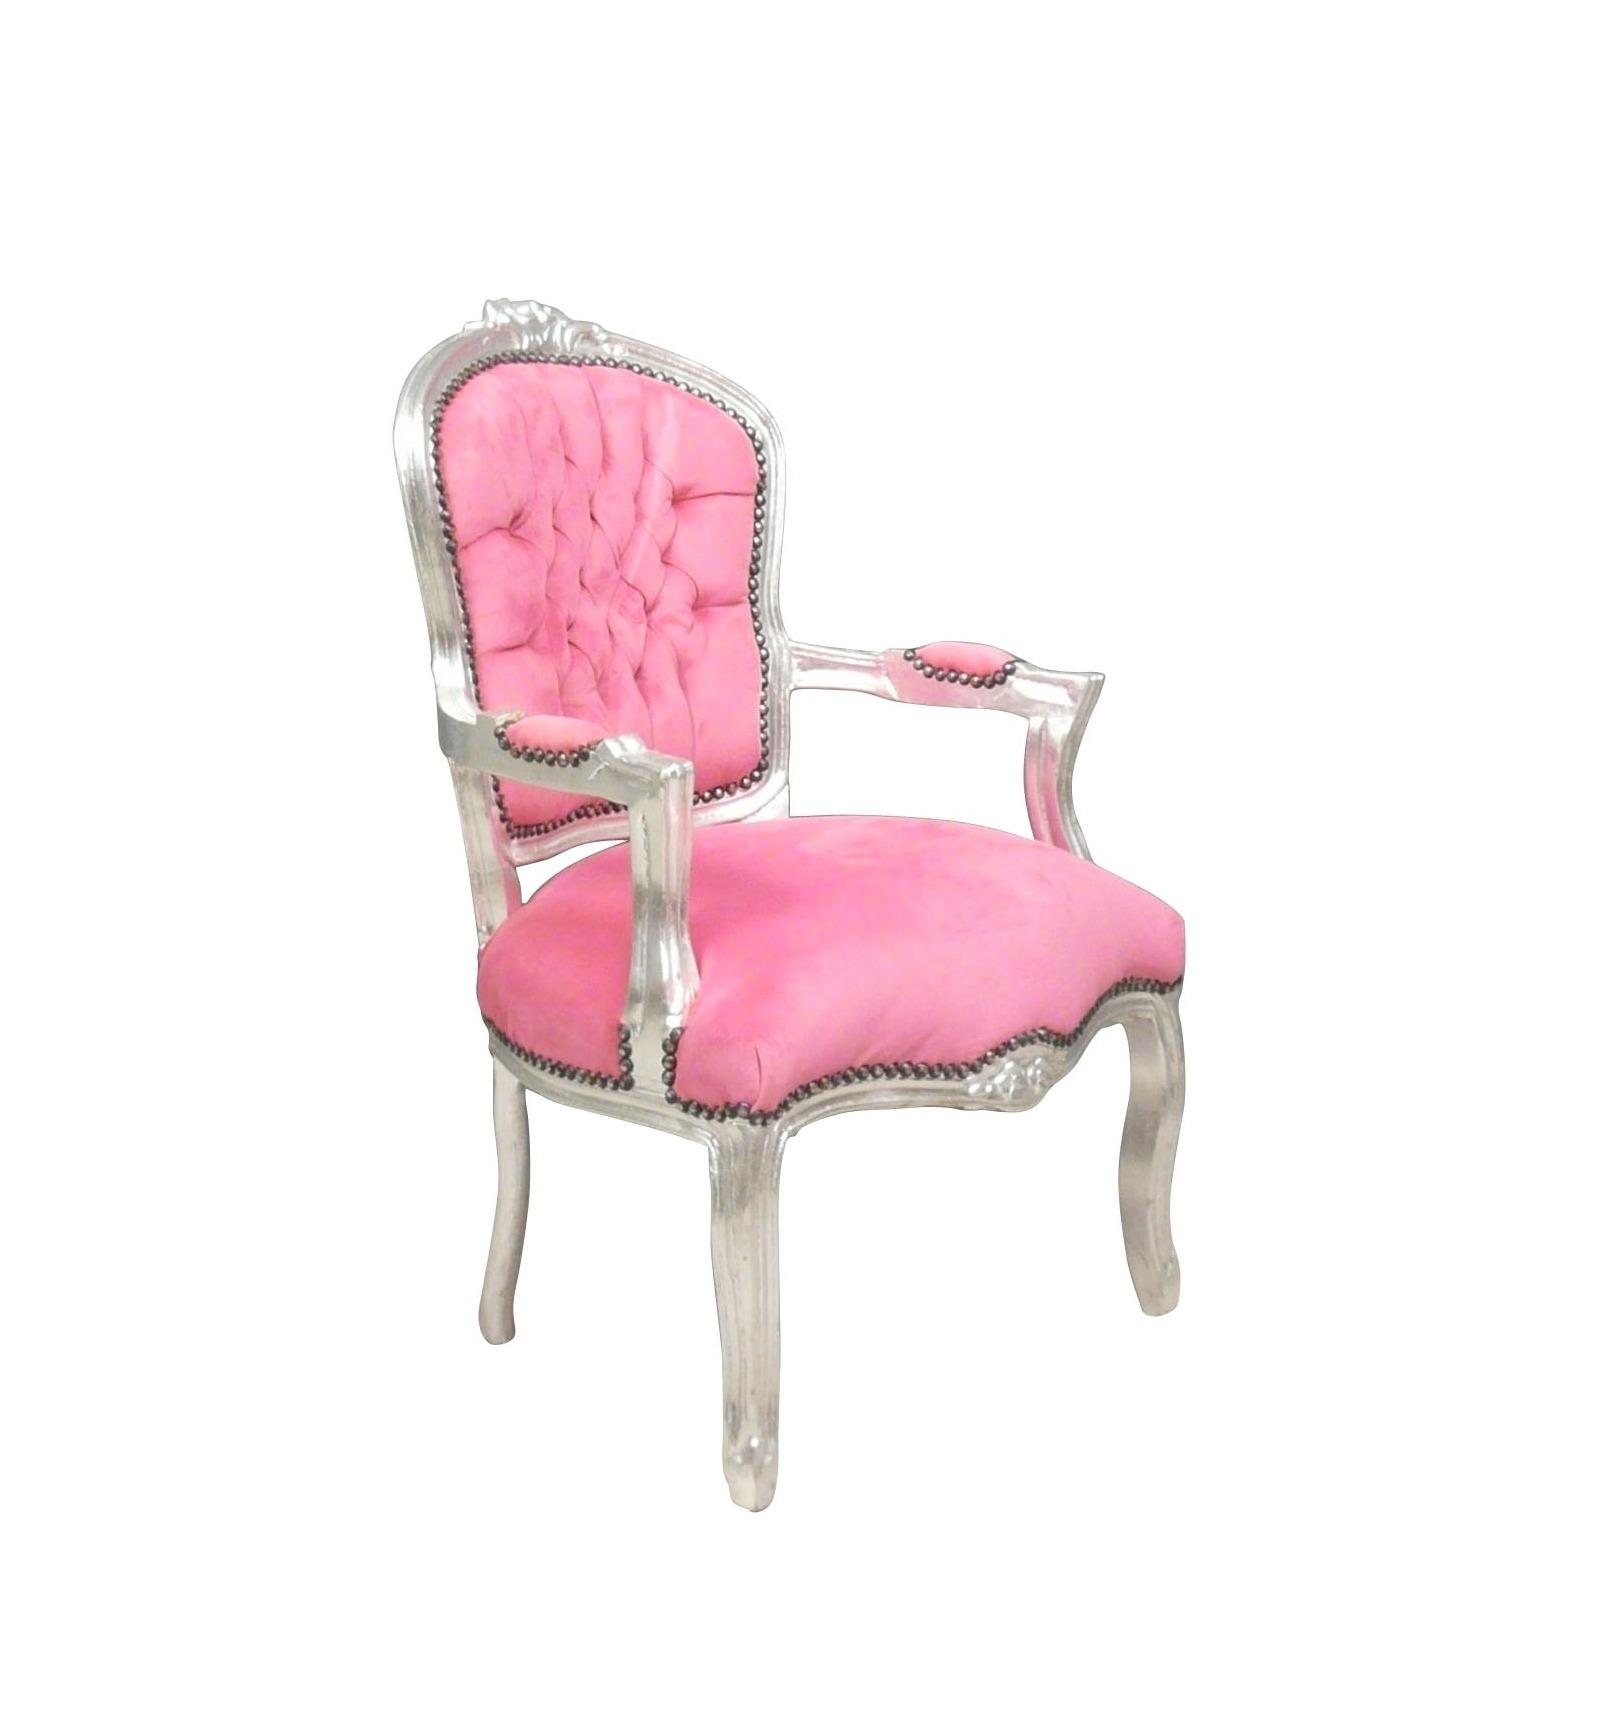 fauteuil main pas cher fauteuil design en ska pour pas cher uac with fauteuil main pas cher. Black Bedroom Furniture Sets. Home Design Ideas